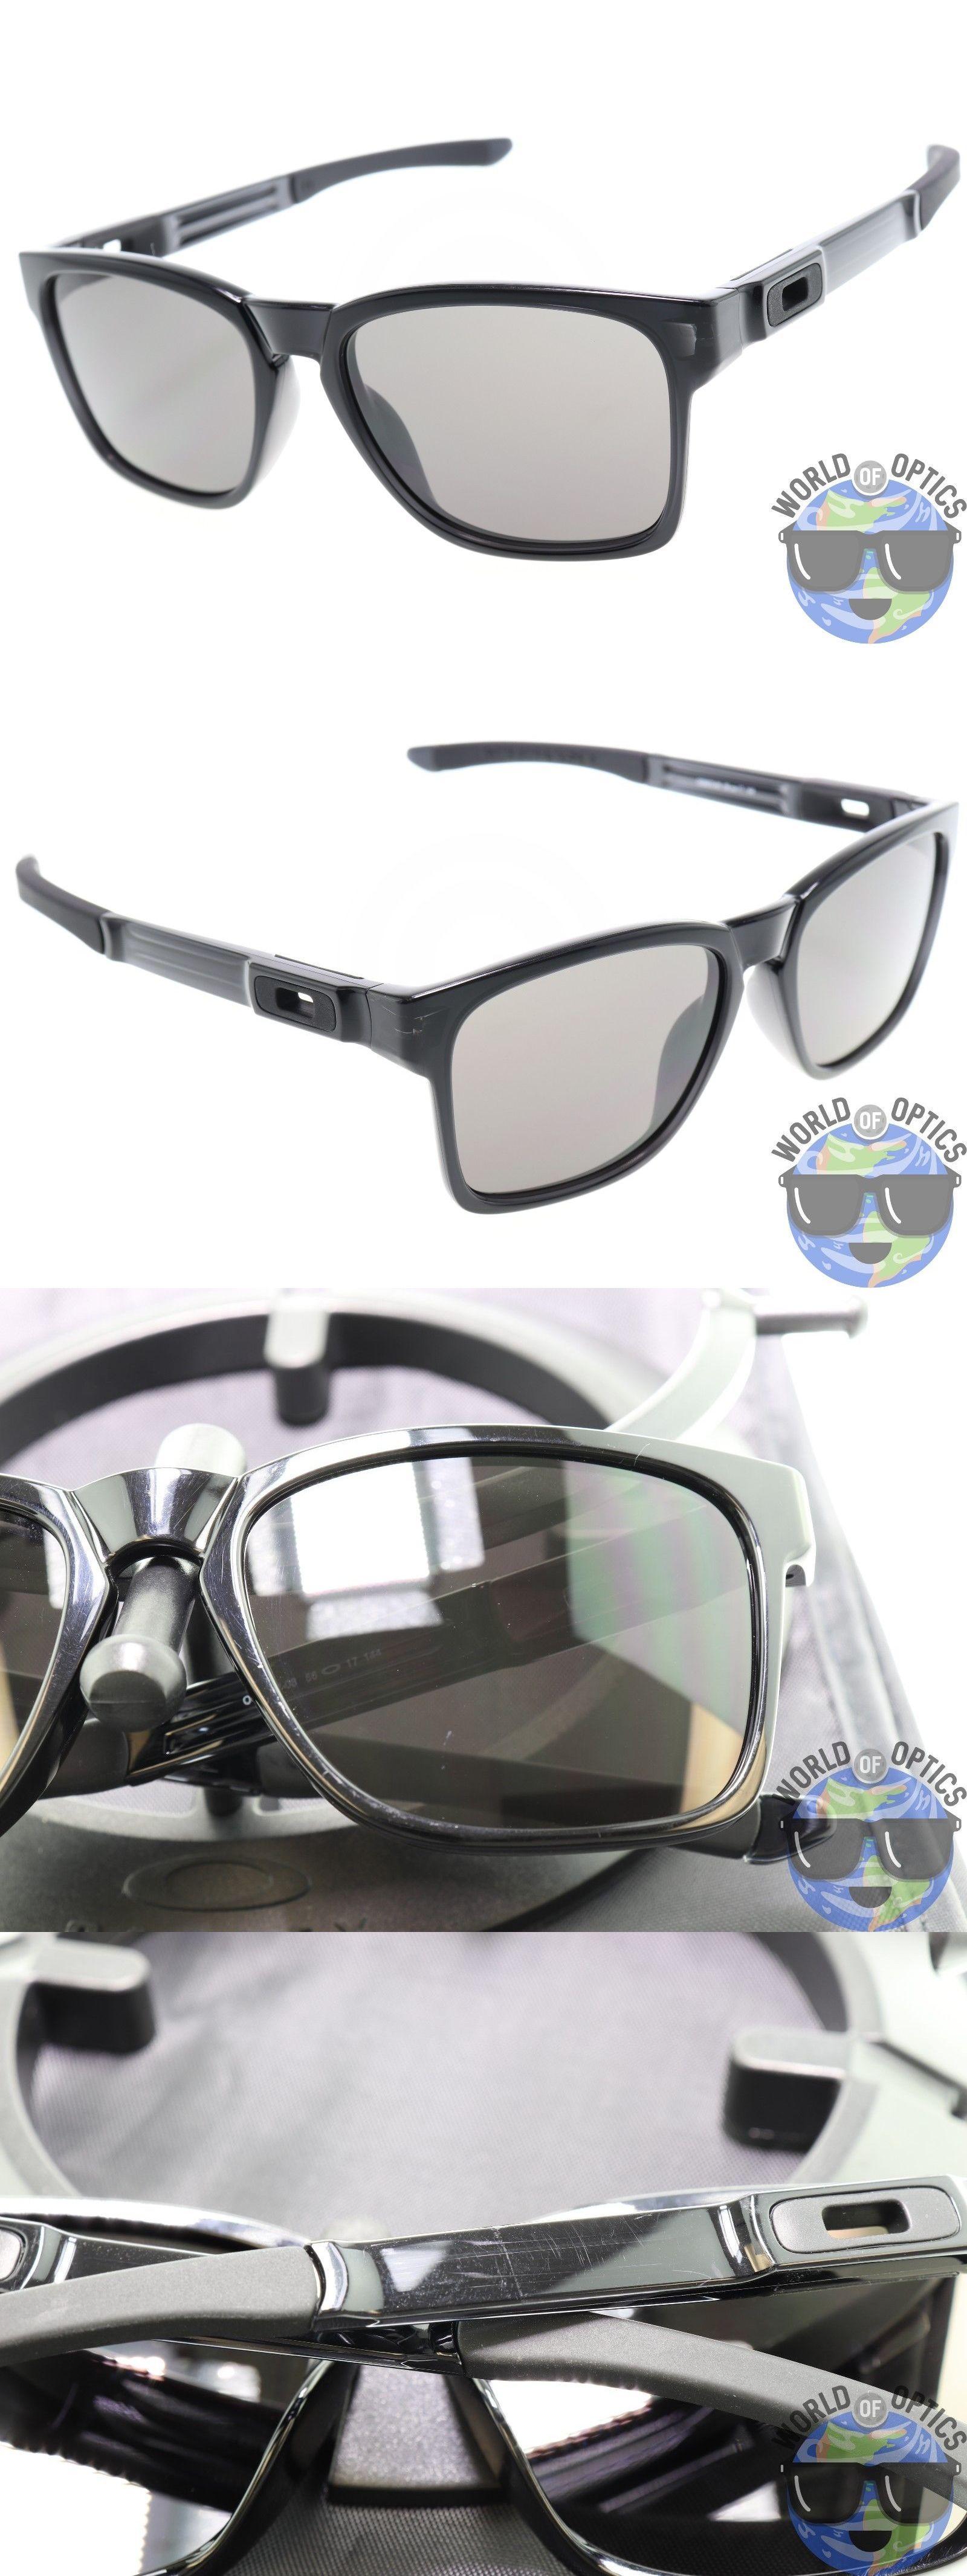 e9bf33f049 ... cheap sunglasses 79720 oakley catalyst sunglasses oo9272 08 black ink  frame w warm grey lenses 4d87f